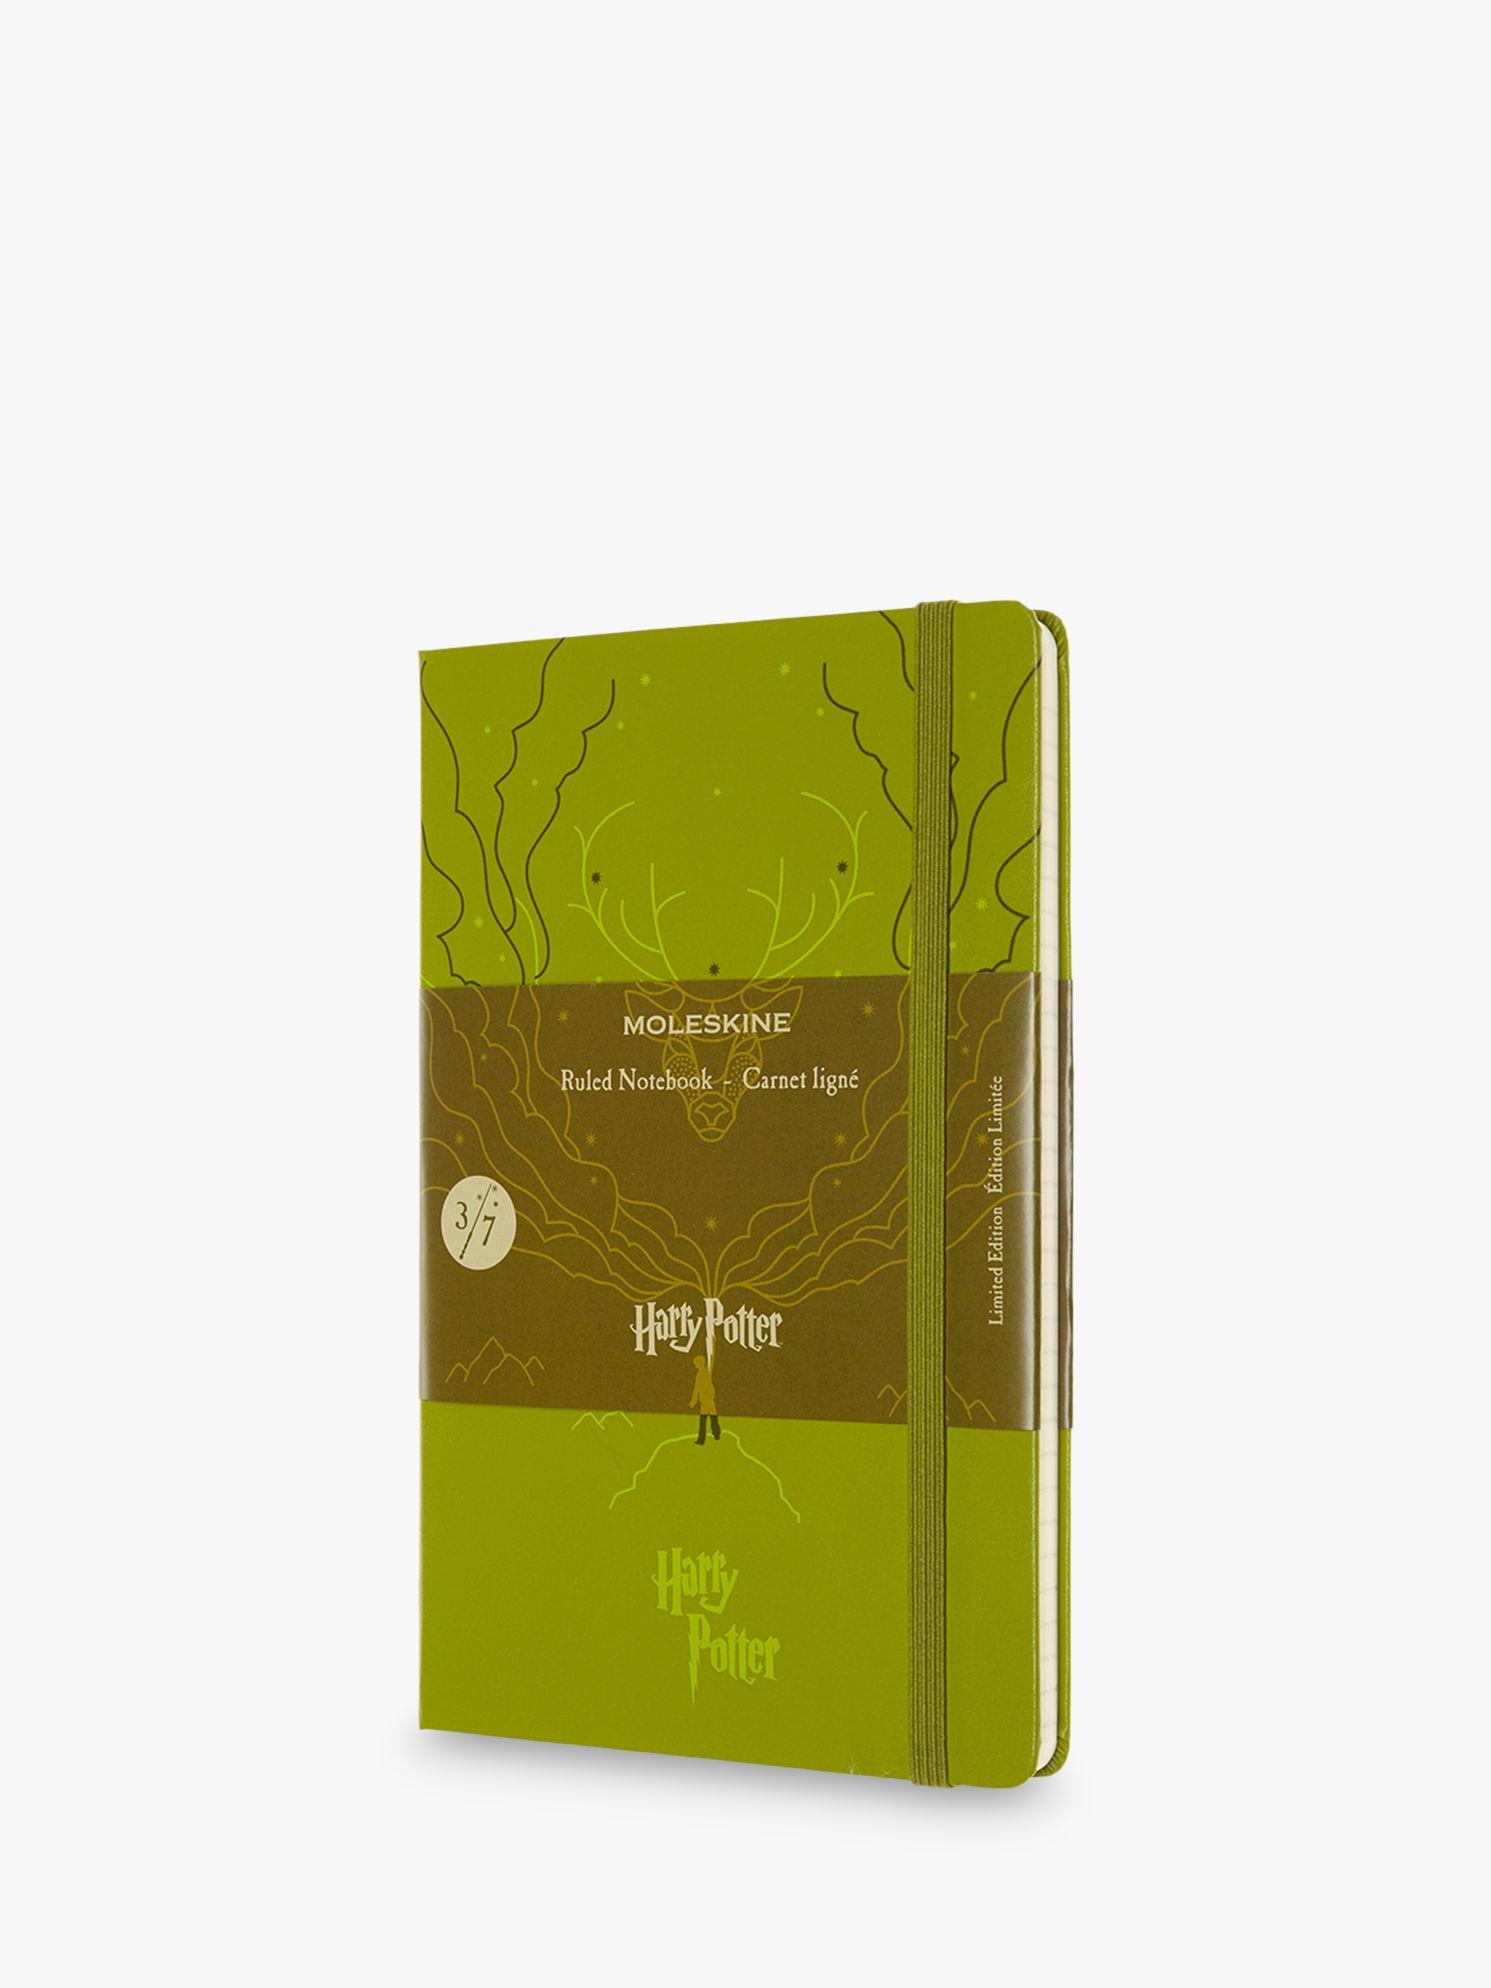 Moleskine Moleskine A5 Limited Edition Patronus Harry Potter Notebook